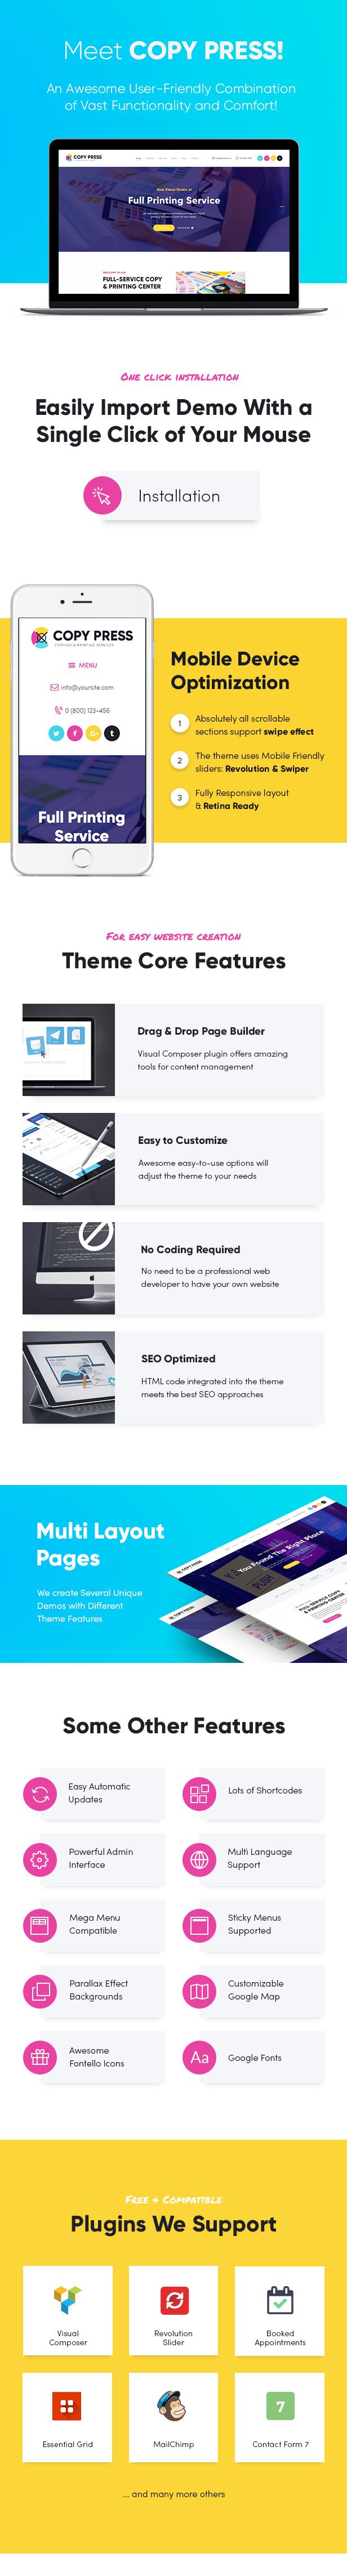 CopyPress | Type Design & Printing Services WordPress Theme - 3